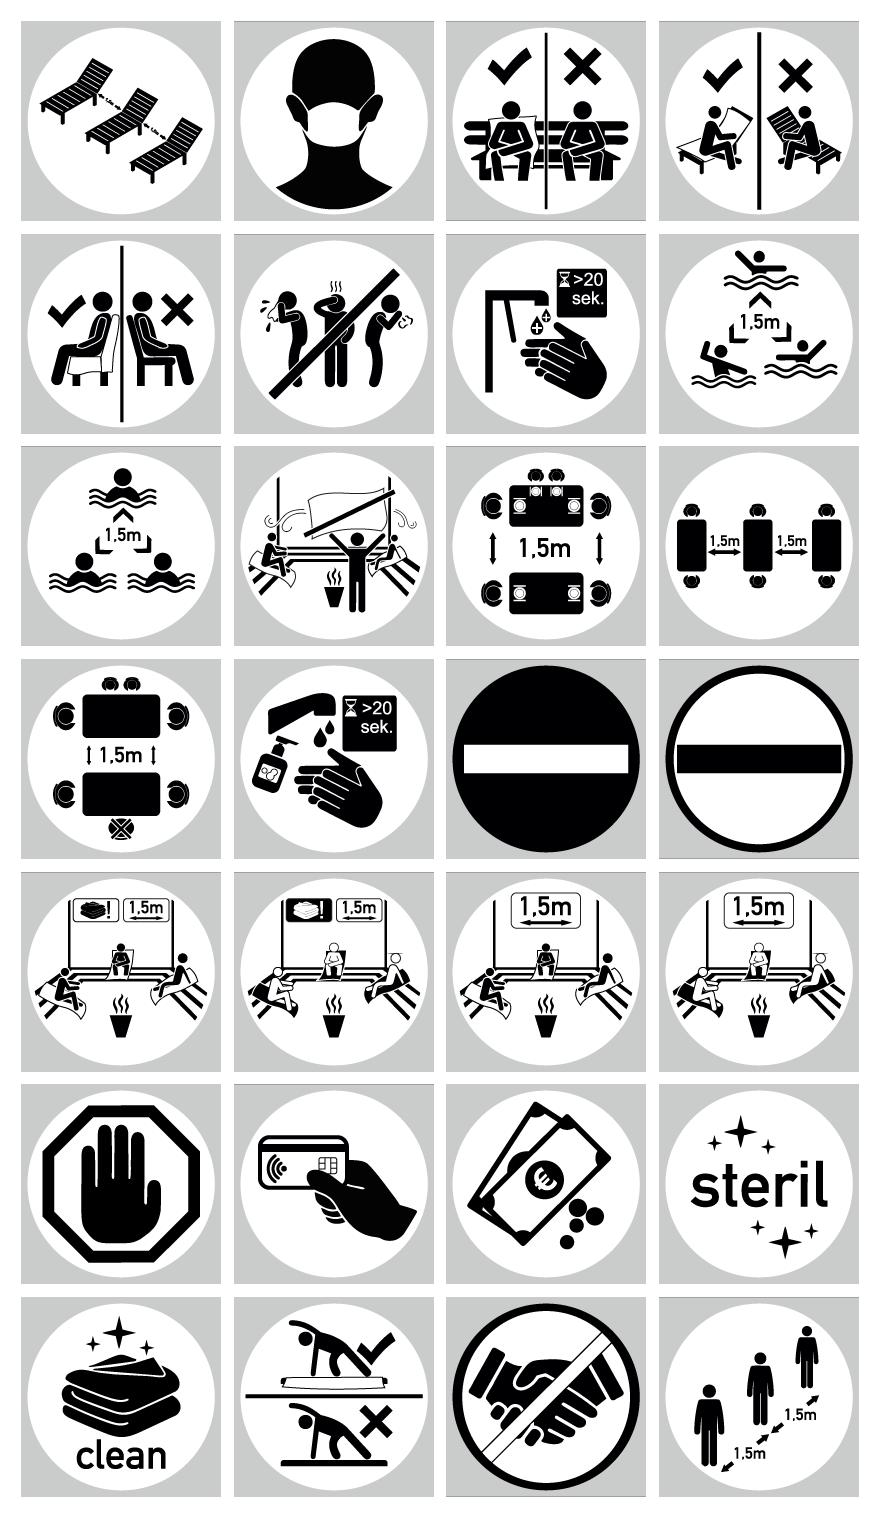 Corona-Schilder Piktogramme